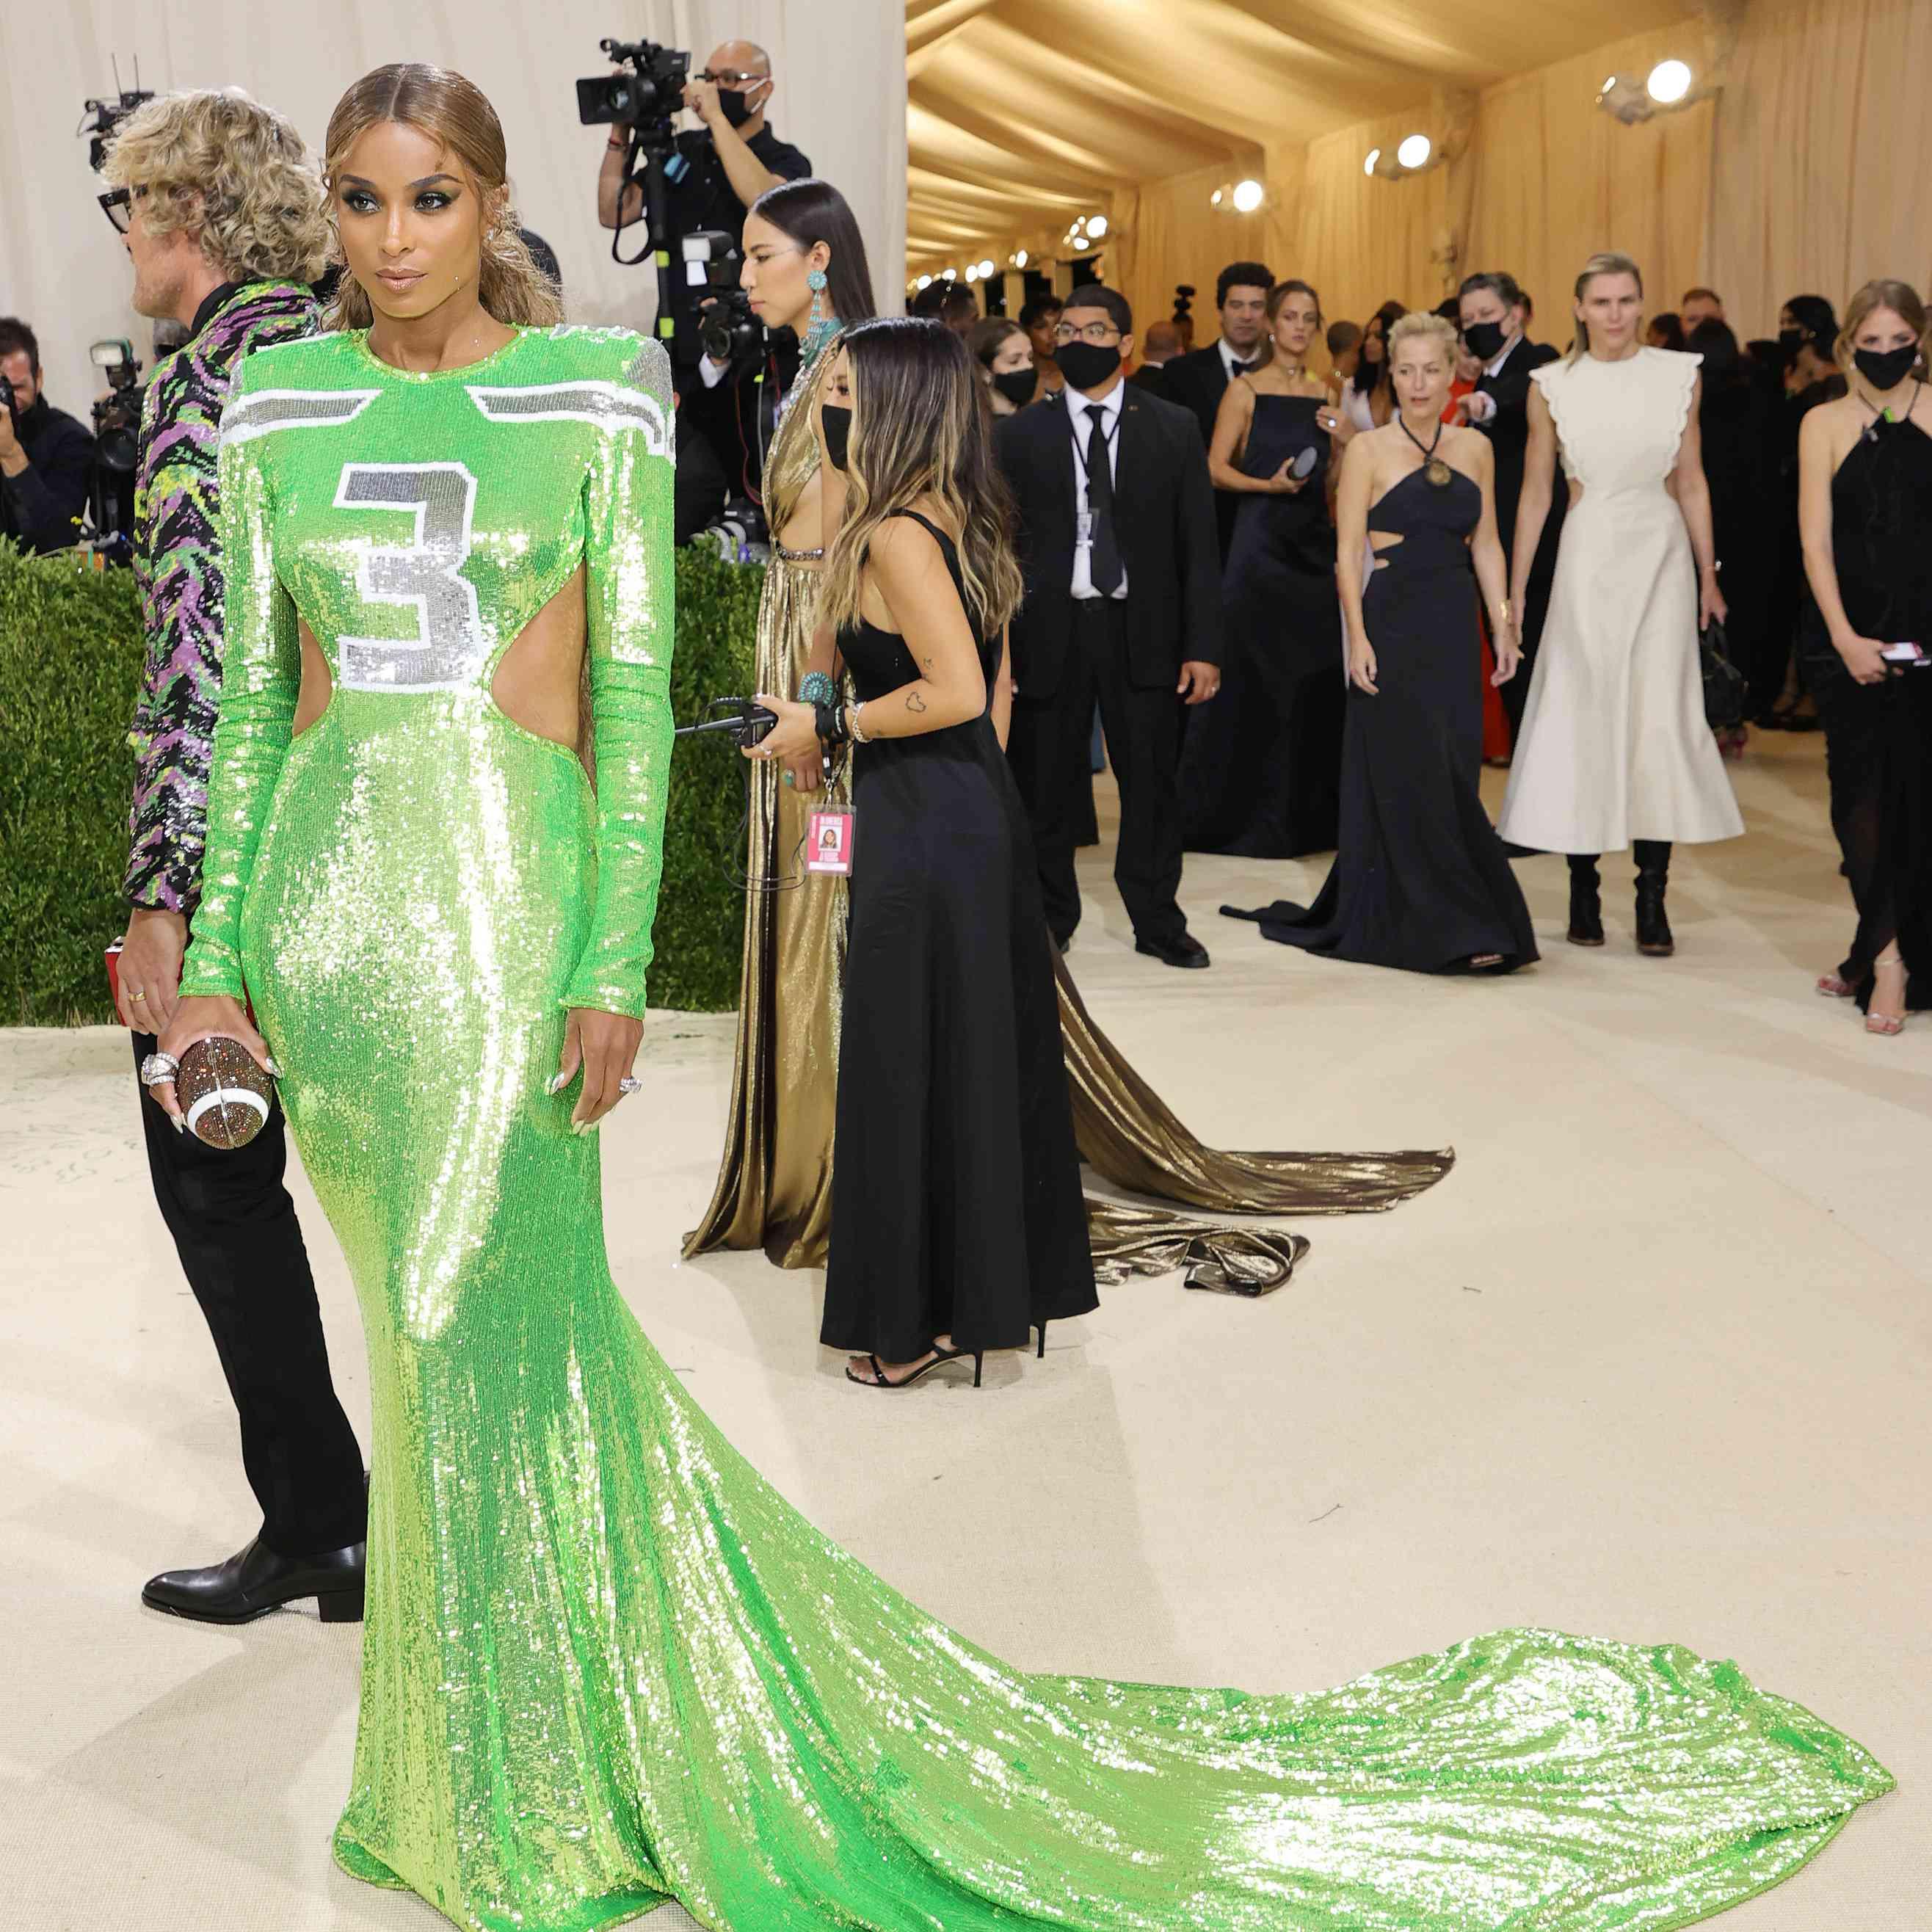 Ciara at the 2021 Met Gala